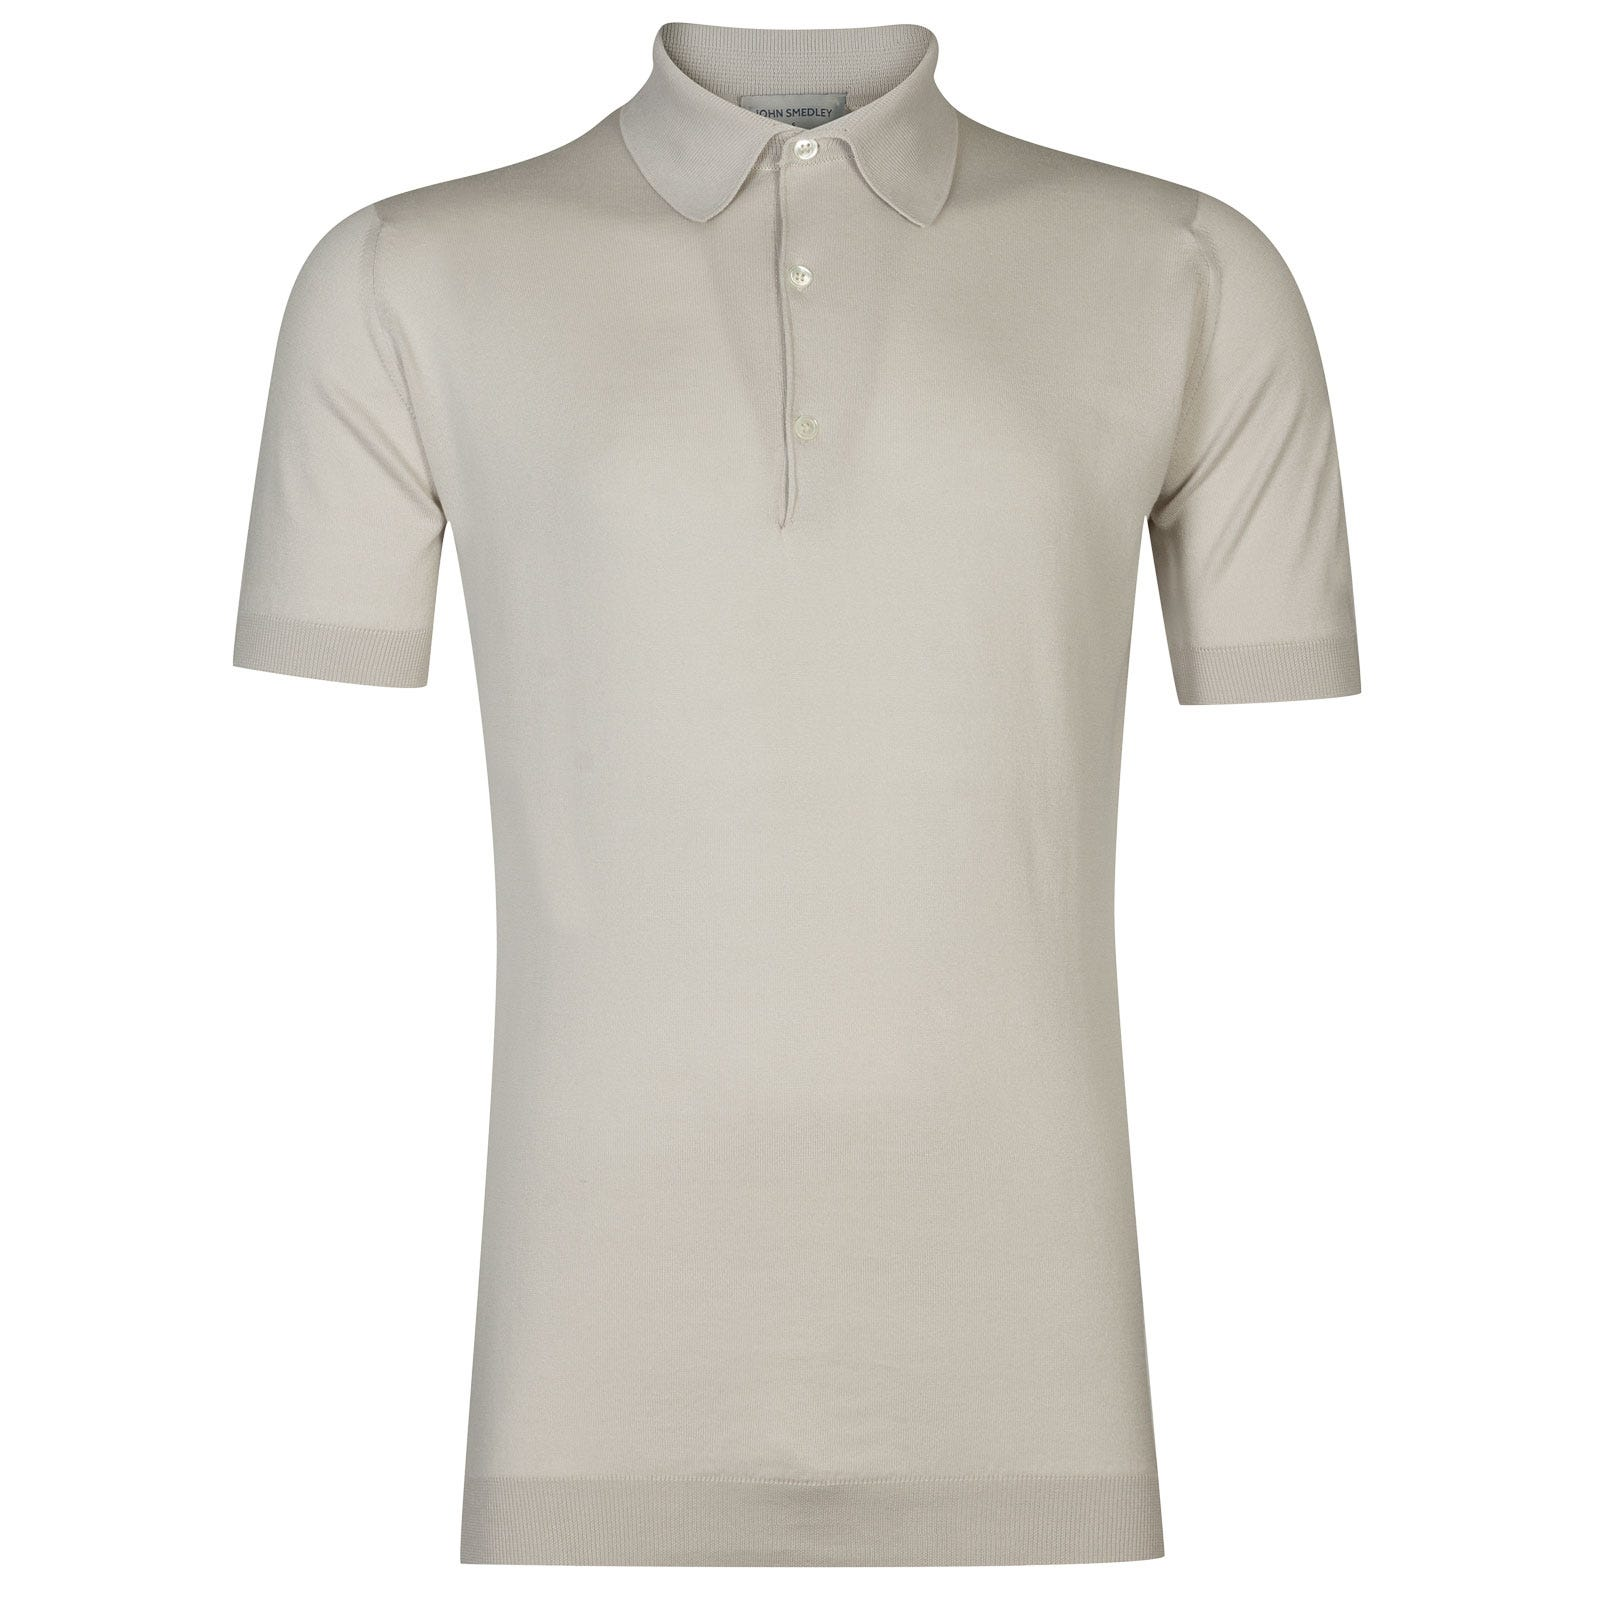 John Smedley Adrian in Brunel Beige Shirt-XXL